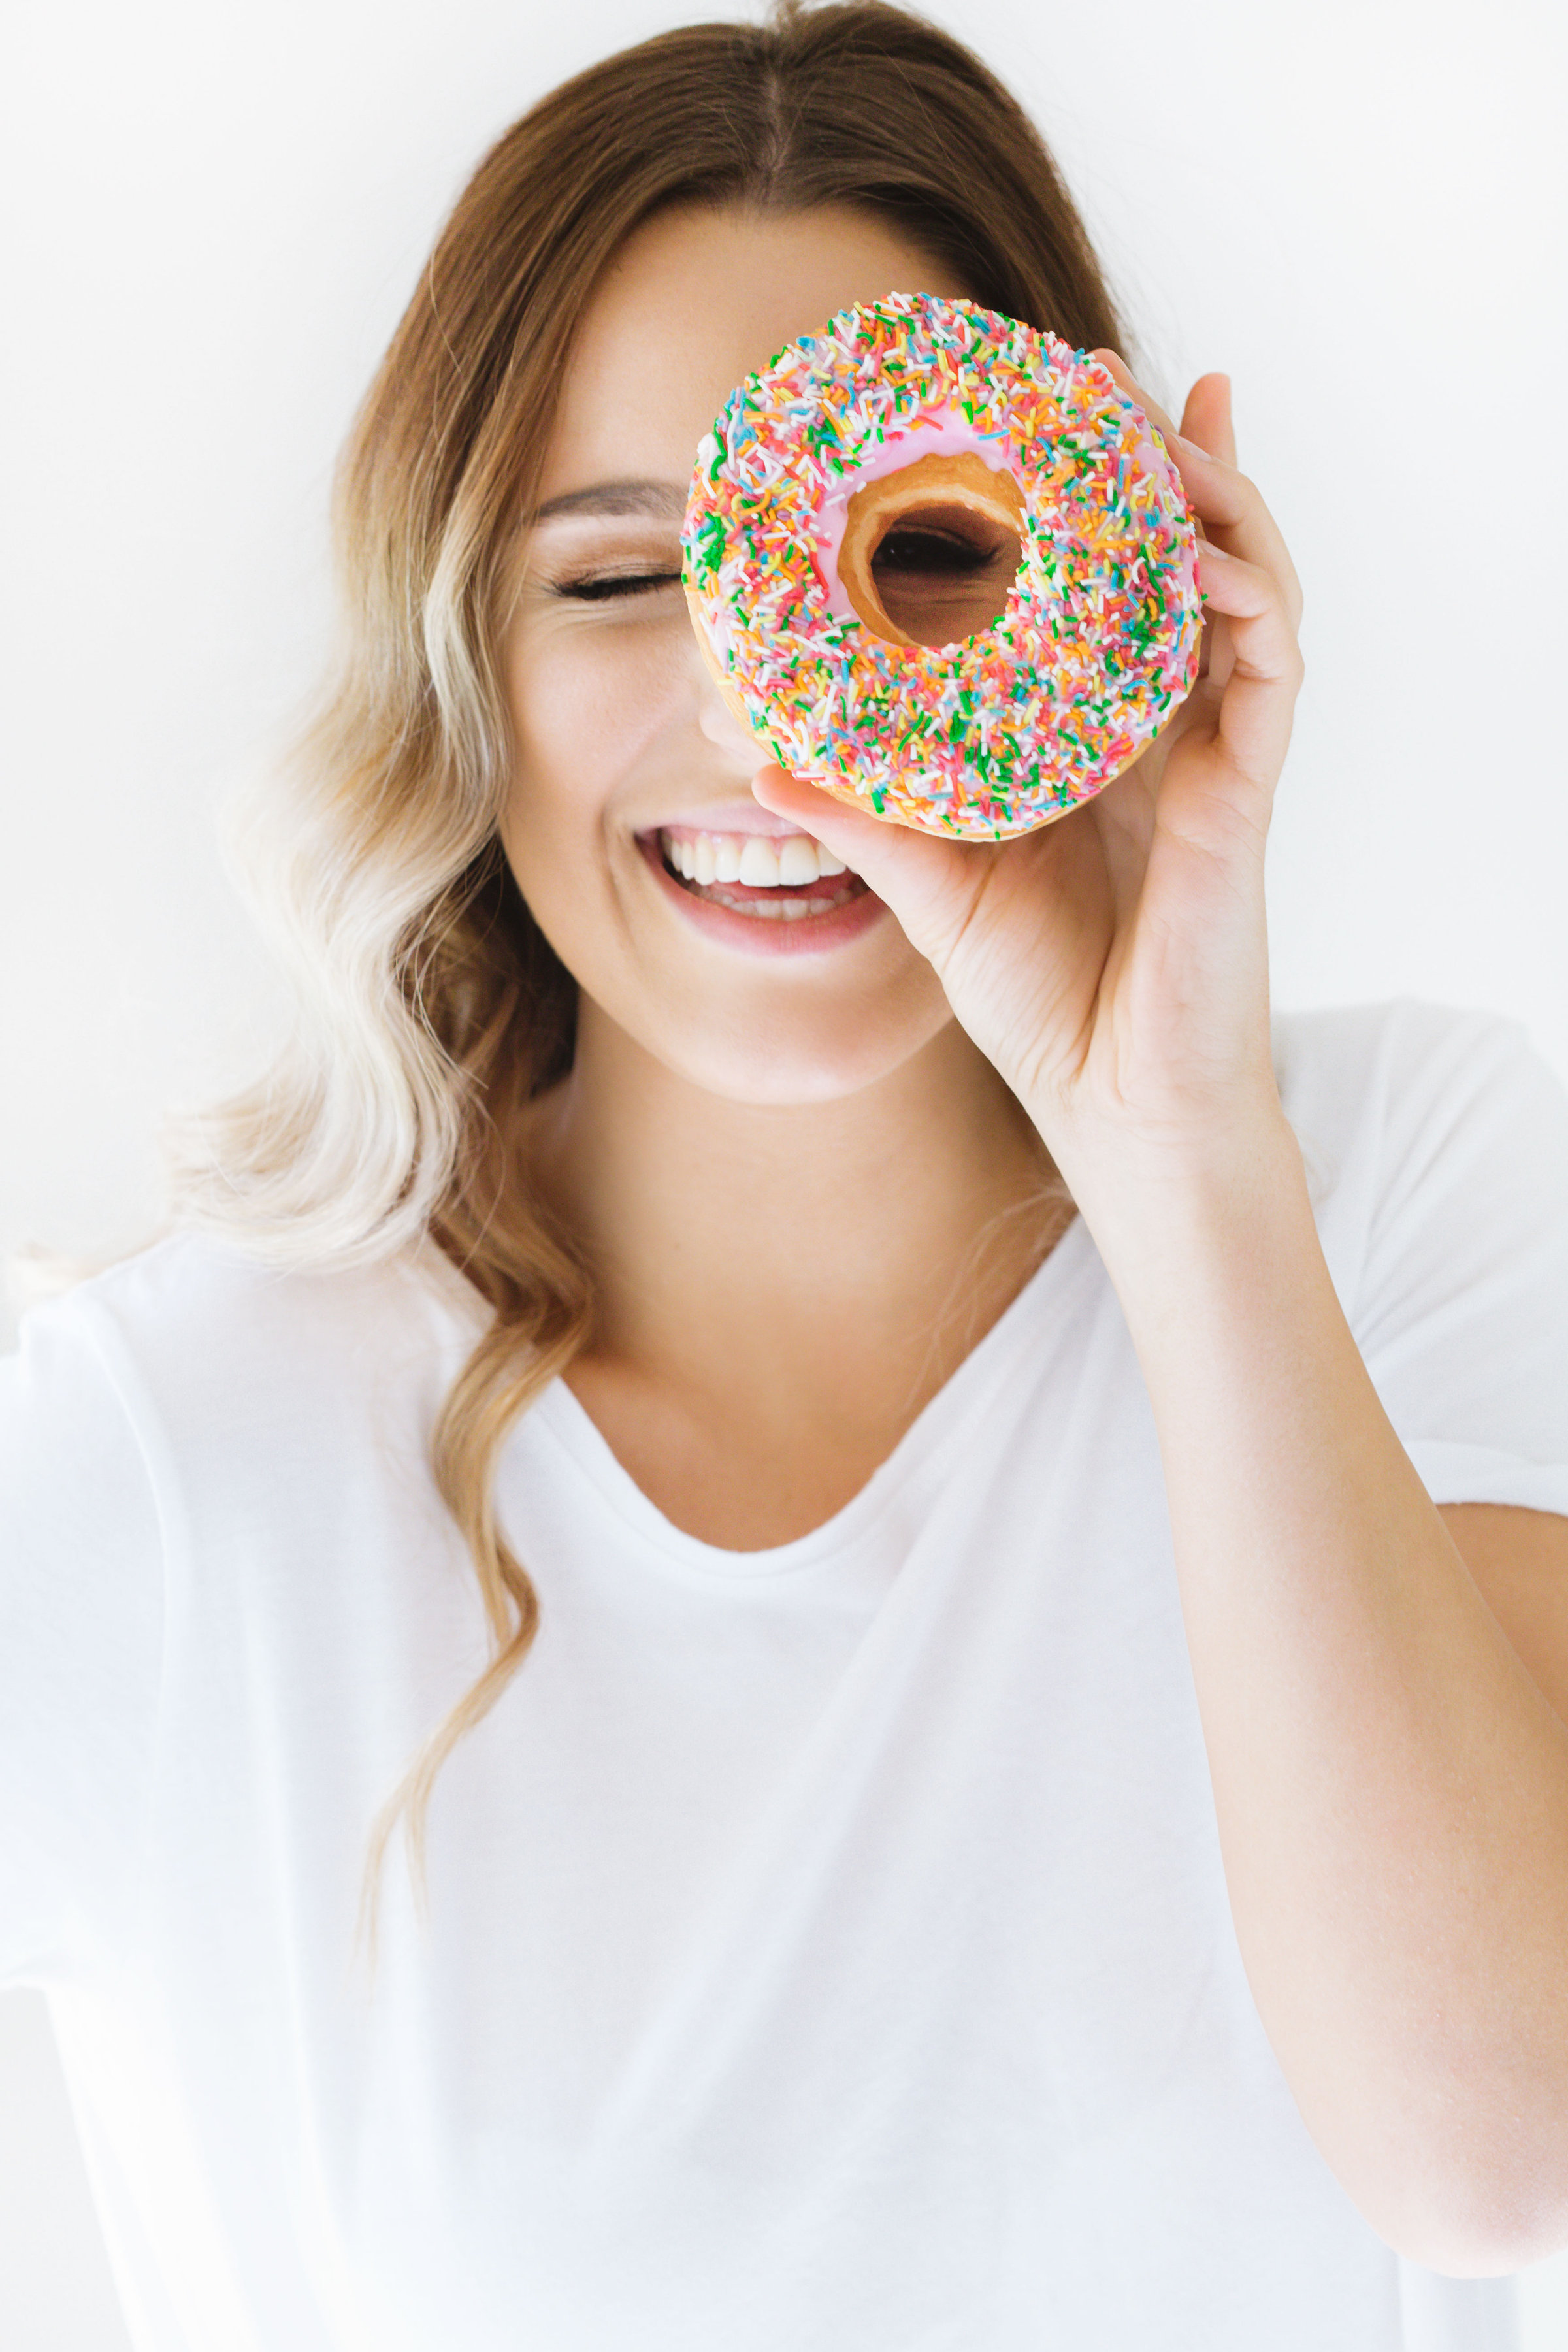 CapturingTheBrand-LeahItsines-Donut2.jpg